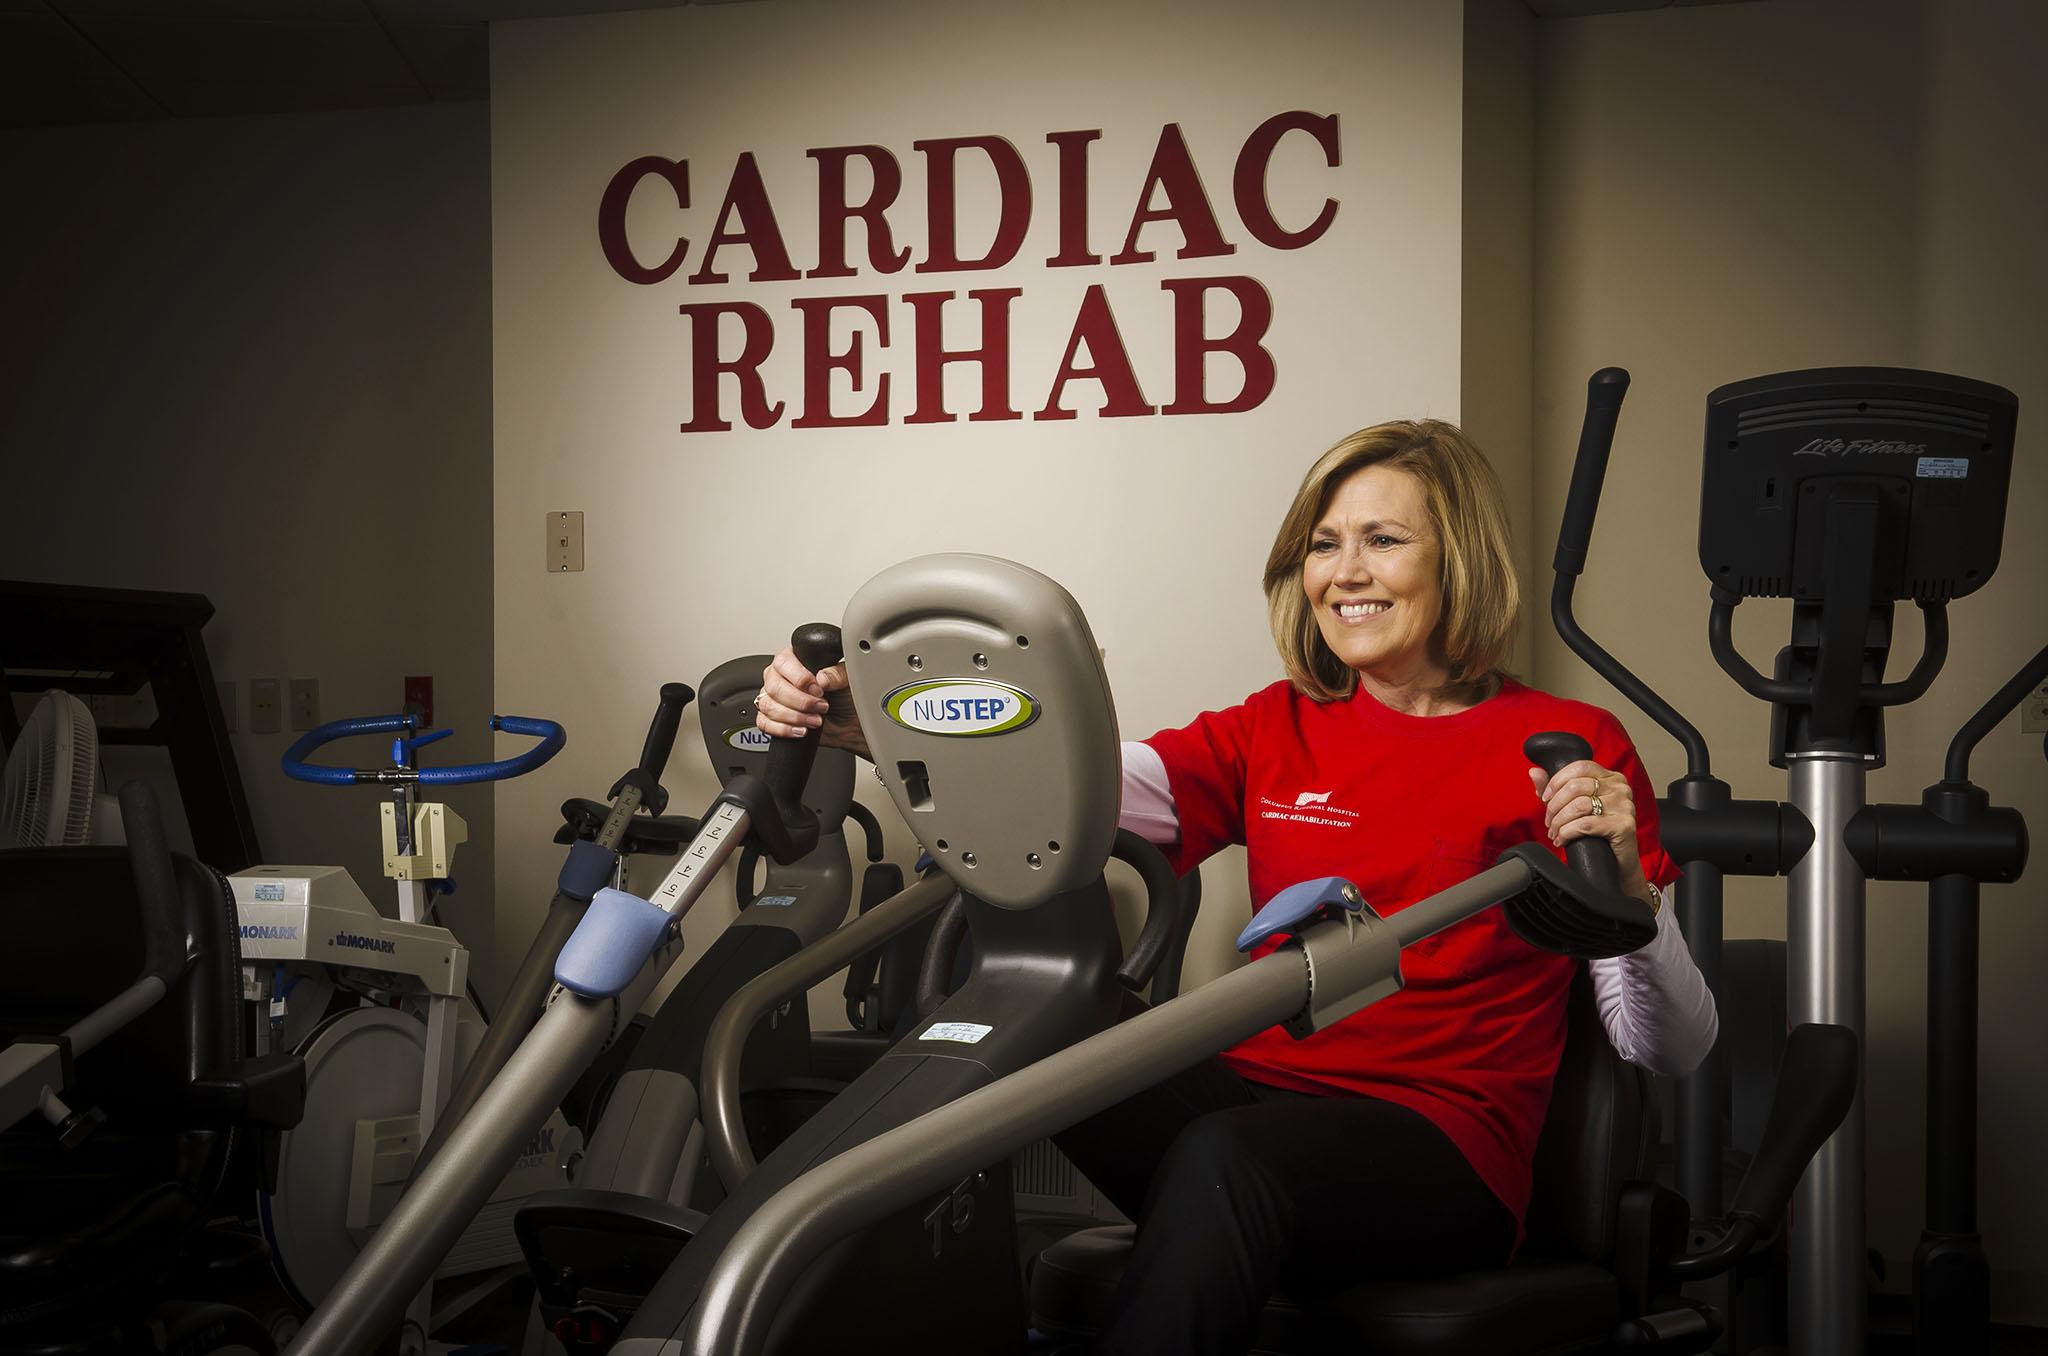 Linda Scheidt exercises in Cardiac Rehab at Columbus Regional Hospital